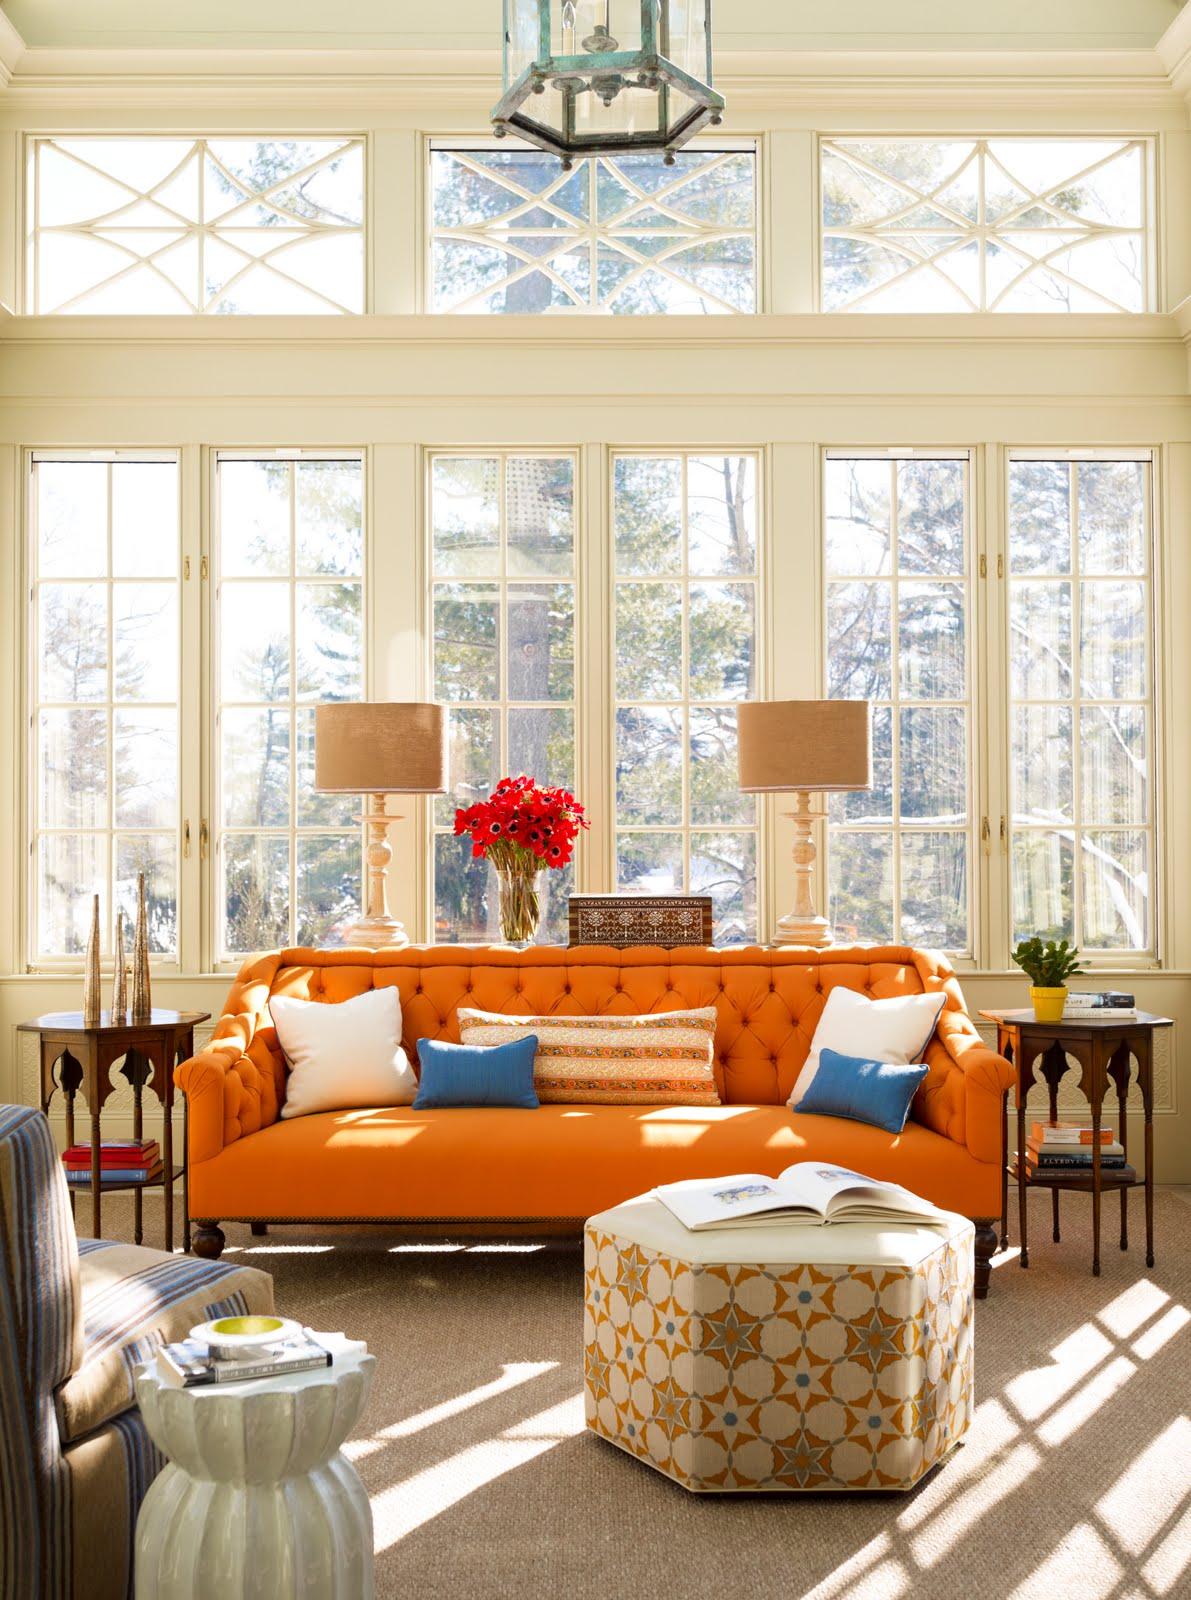 Vintage decorating with orange